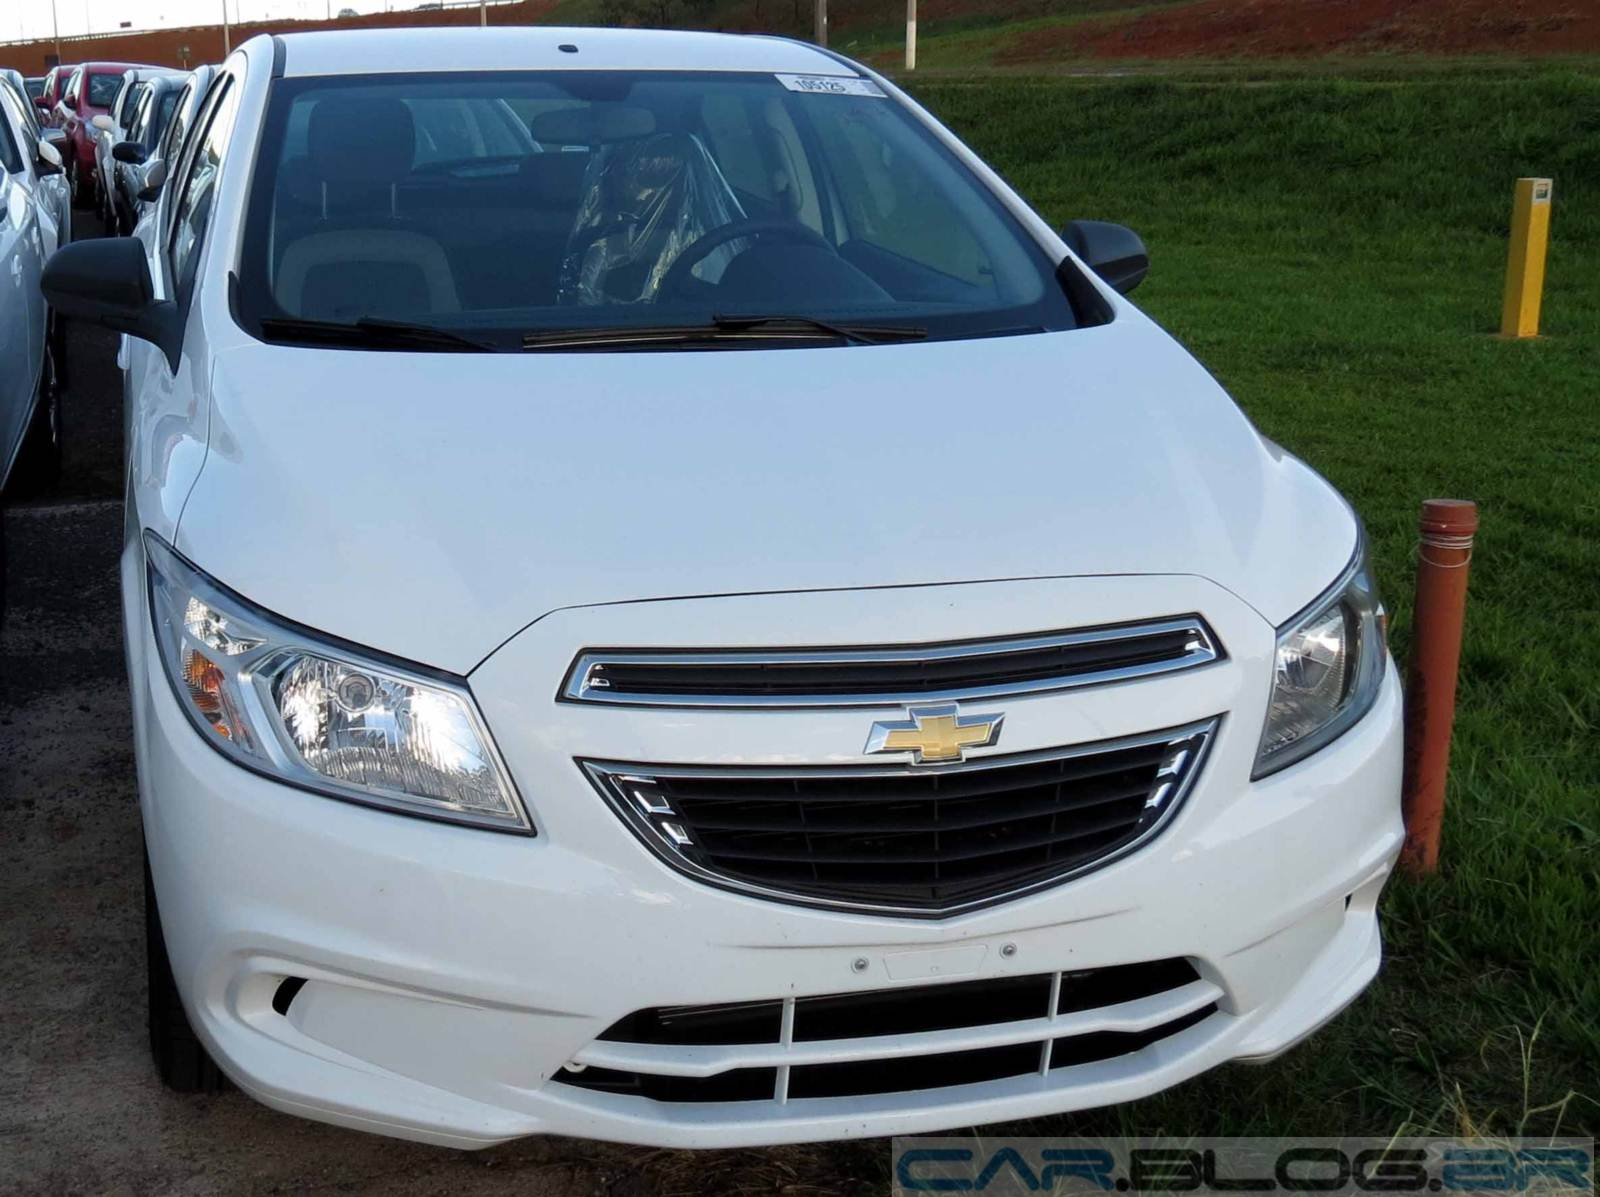 Chevrolet Onix 1.0 2017 x Gol 2017 x HB20 1.0